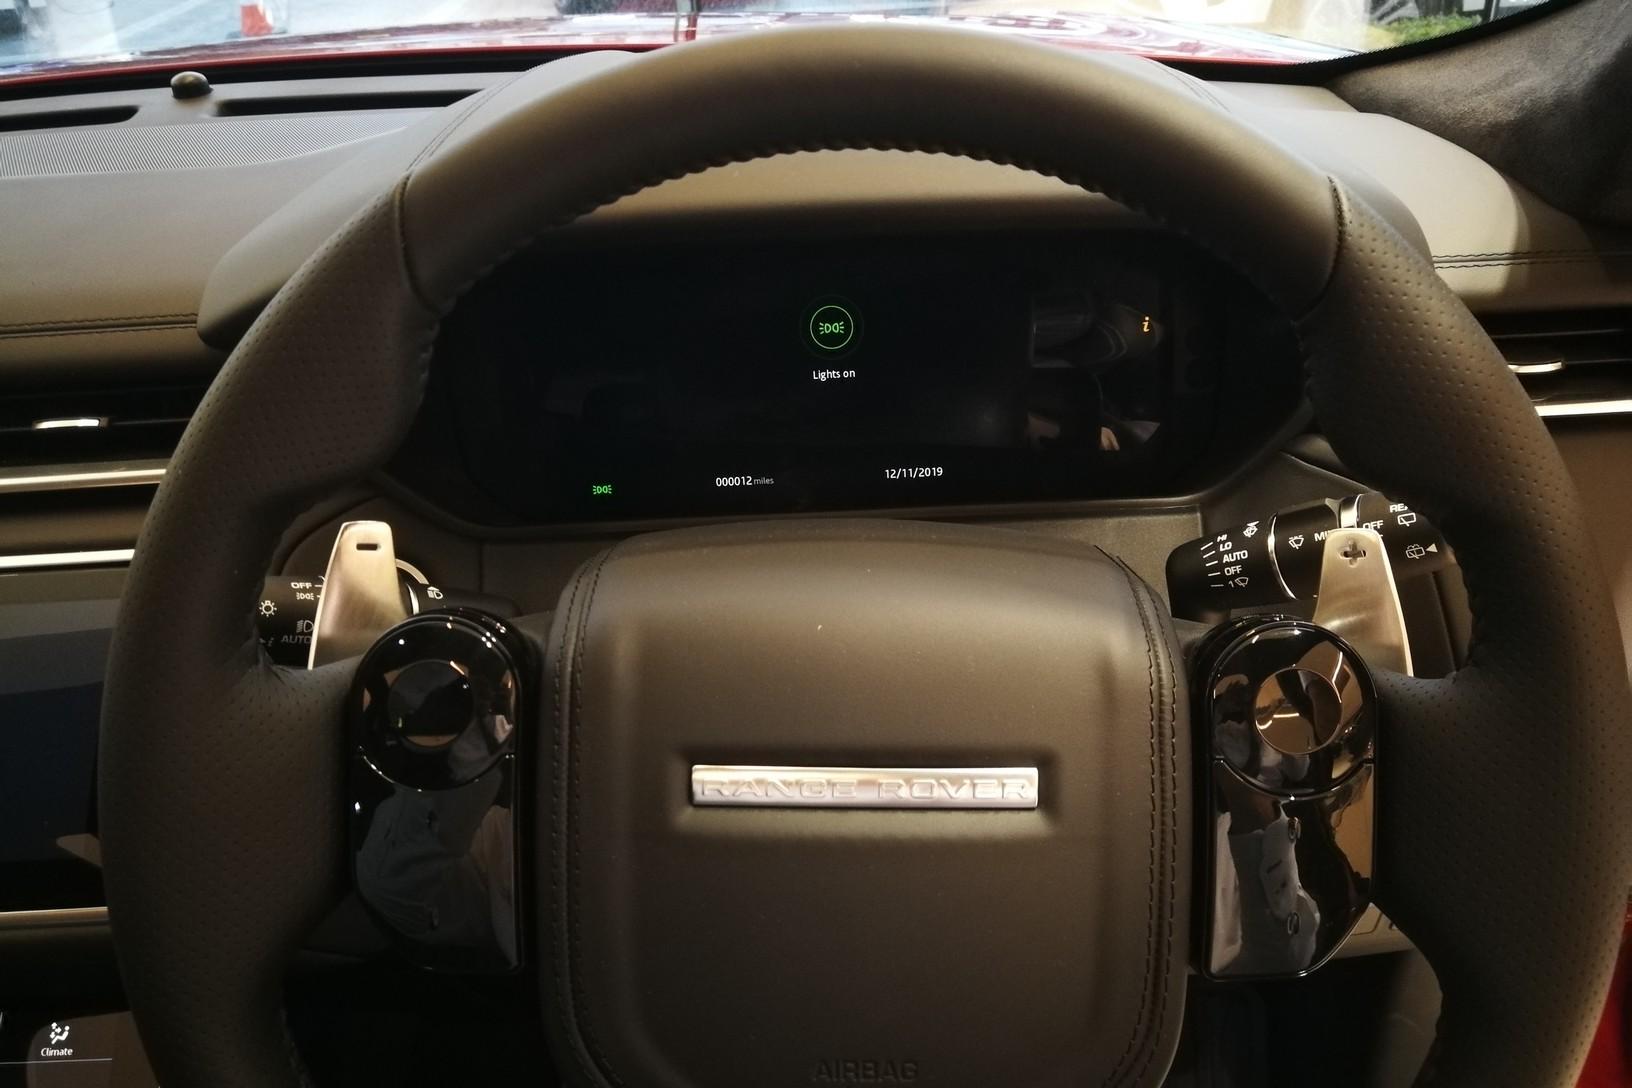 Land Rover Range Rover Velar 5.0 P550 SVAutobiography Dynamic Edition 5dr Auto image 7